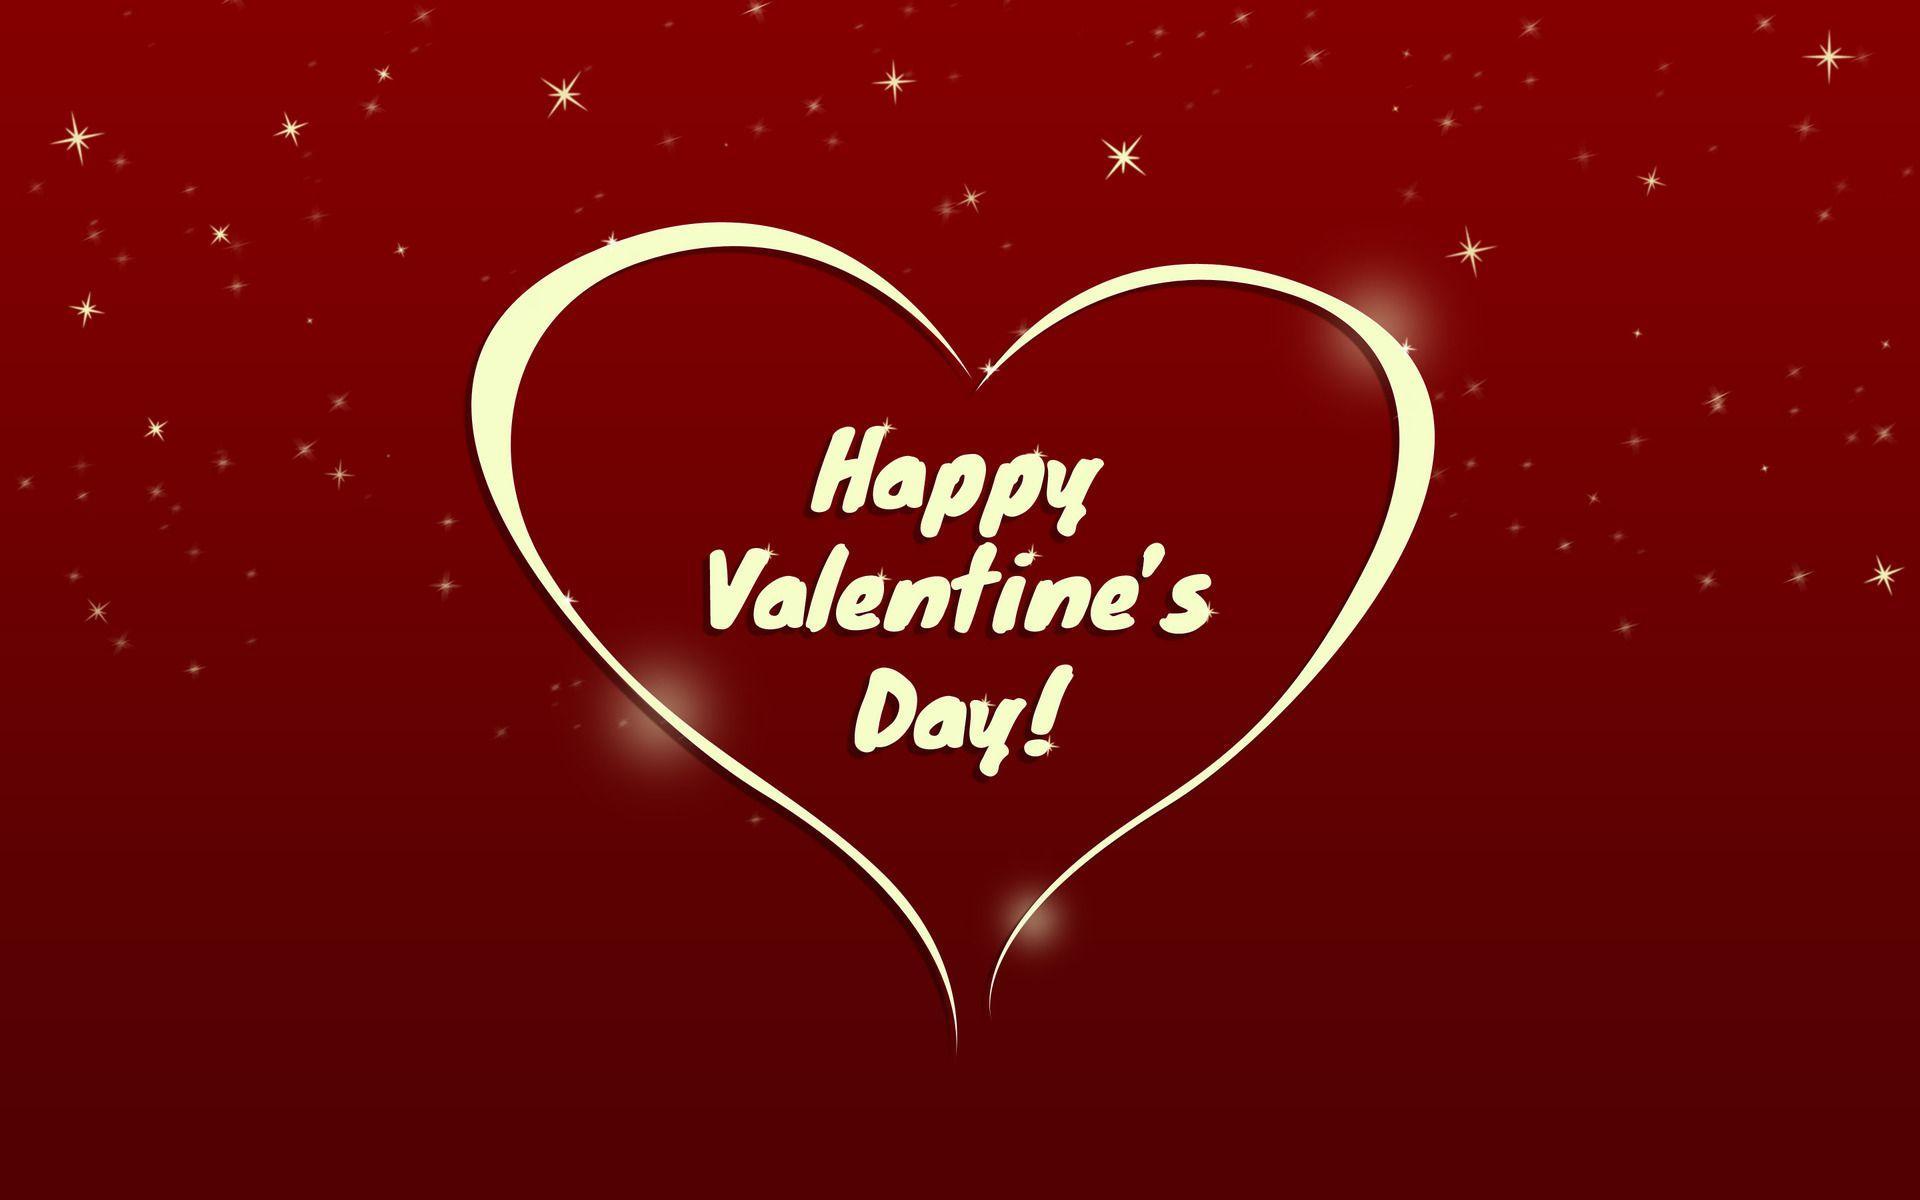 ce happy valentines day - HD1920×1080